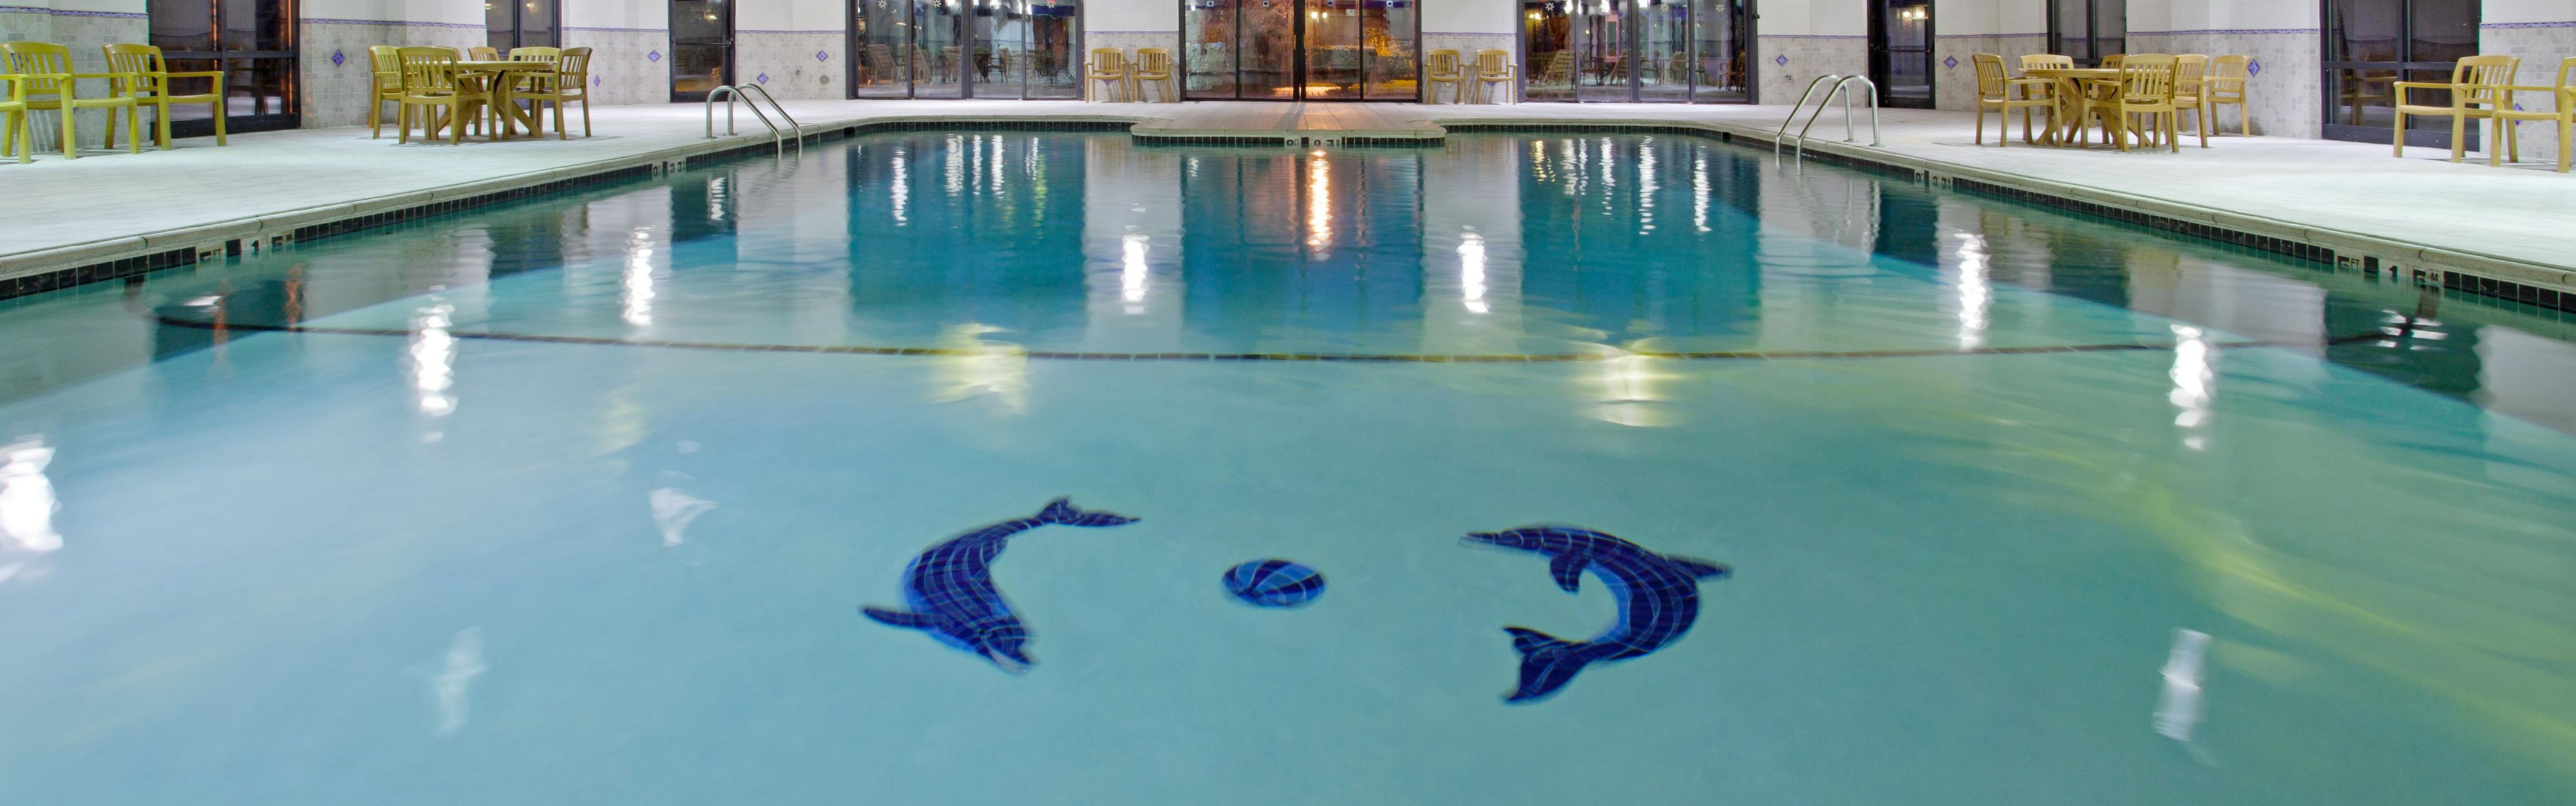 Holiday Inn Southgate (Detroit-South) image 2